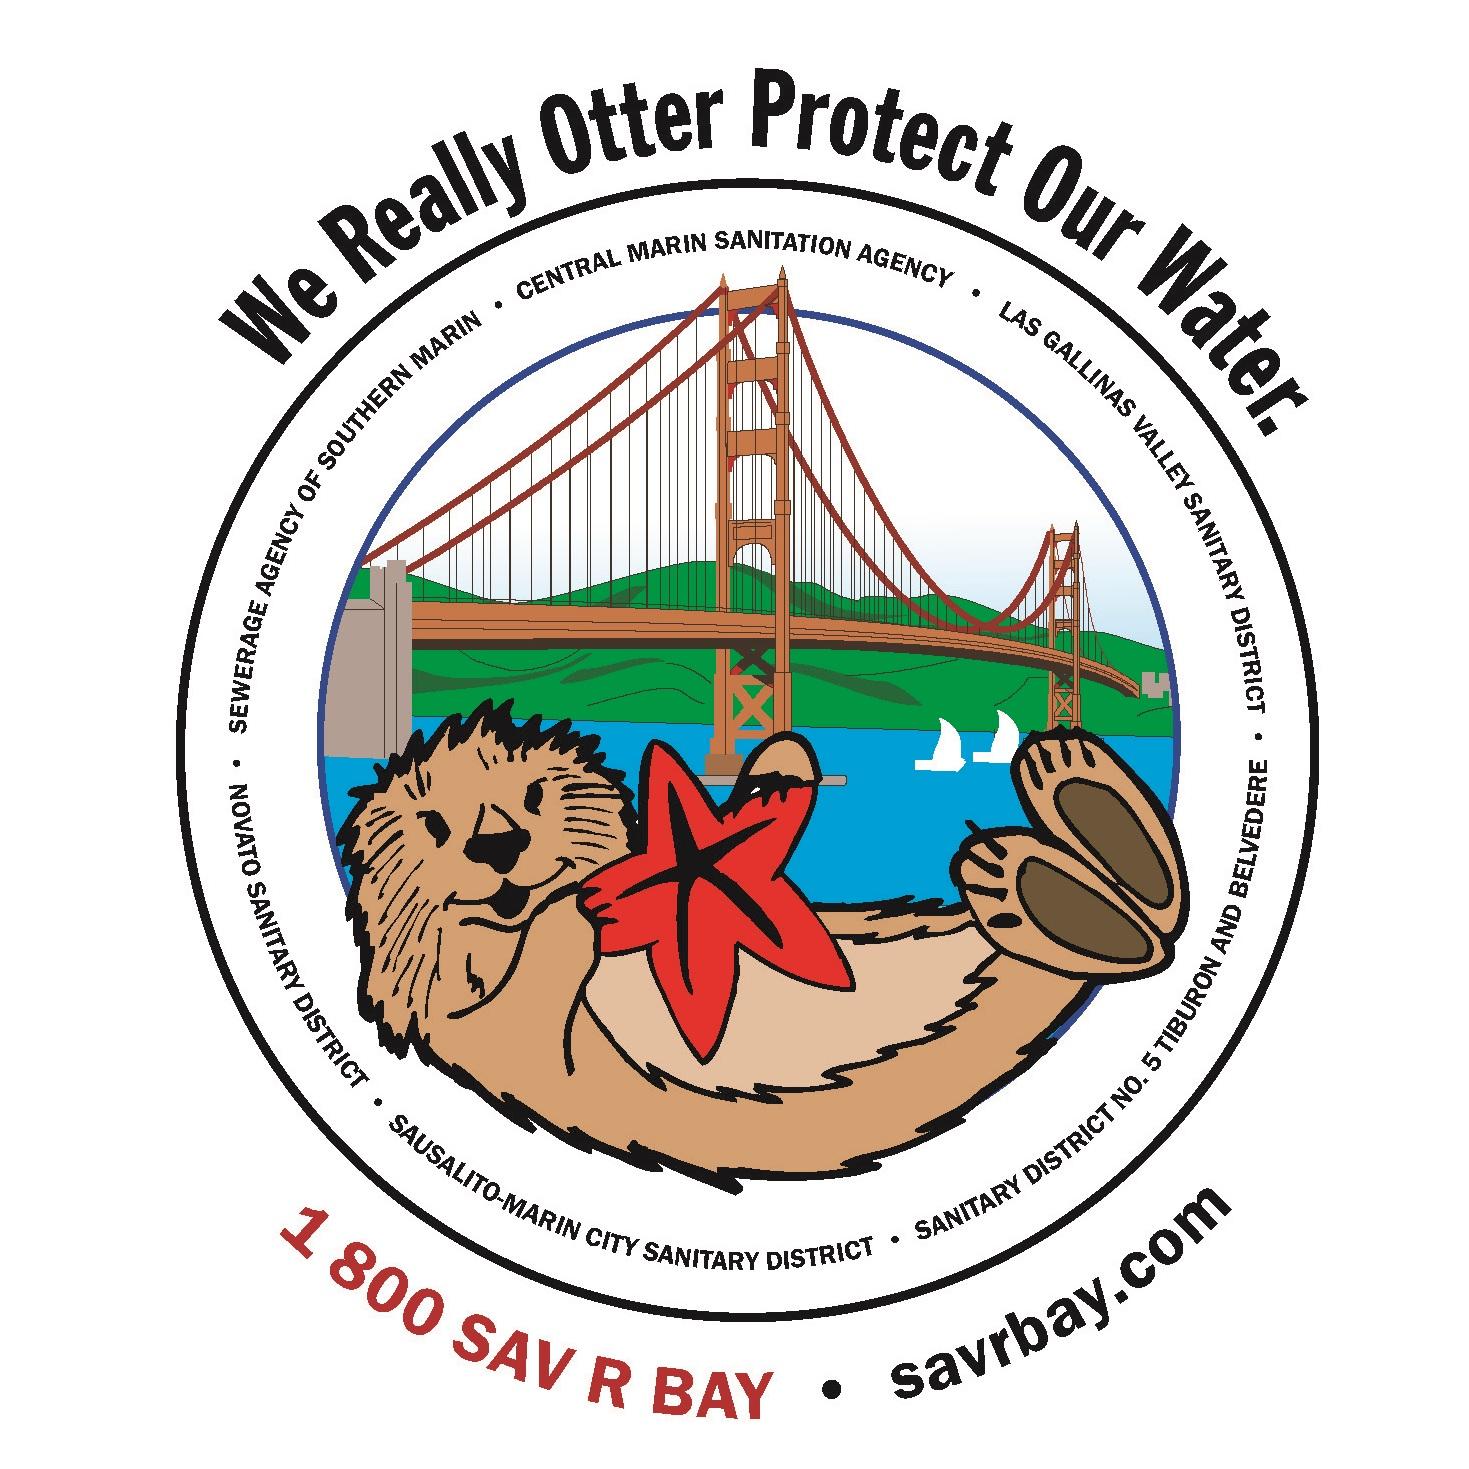 MWW-otter-logo-color1.jpg